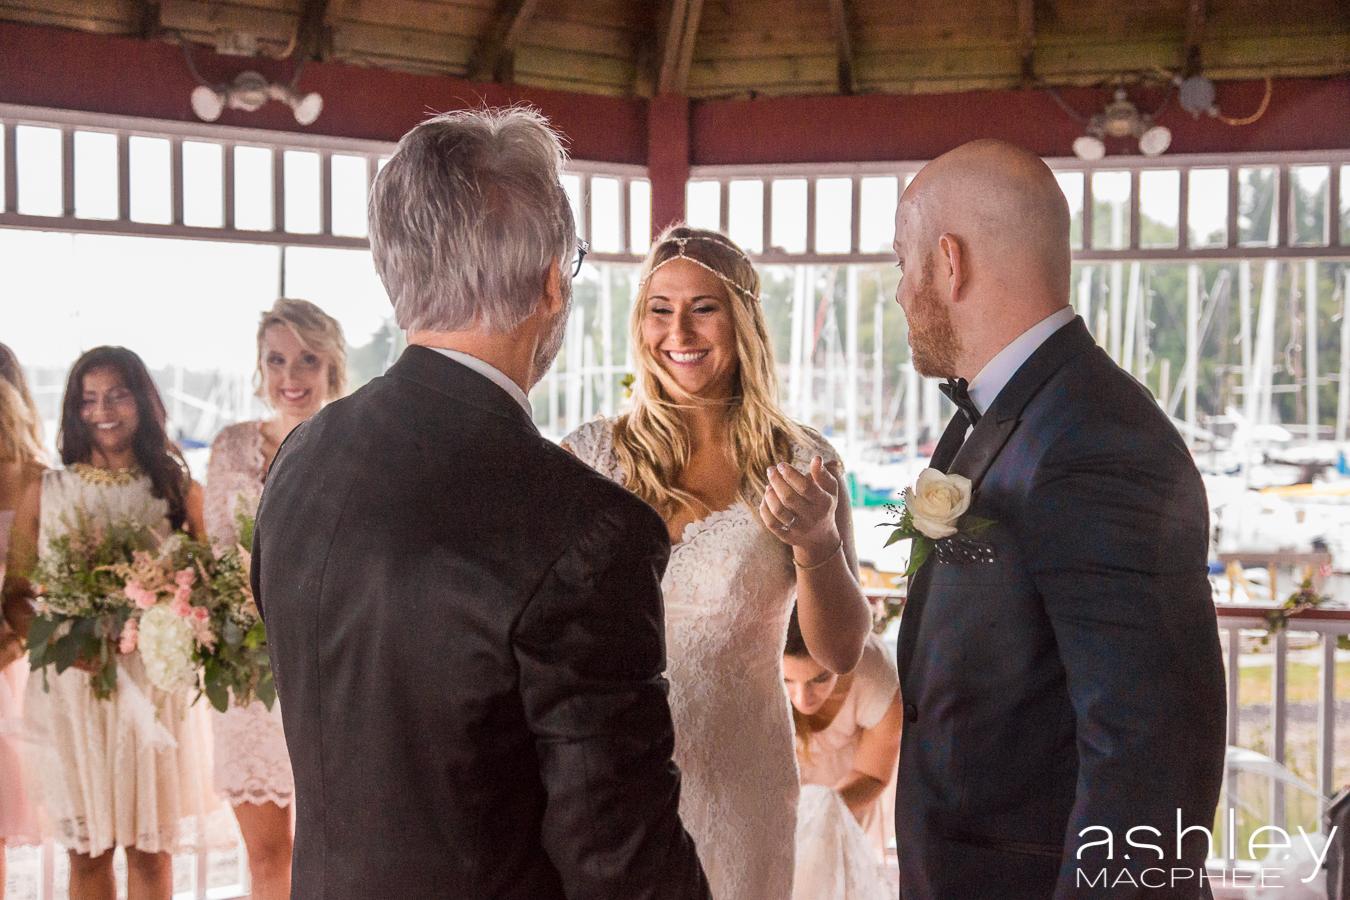 Ashley MacPhee Photography Hudson Yacht Club wedding photographer (50 of 112).jpg